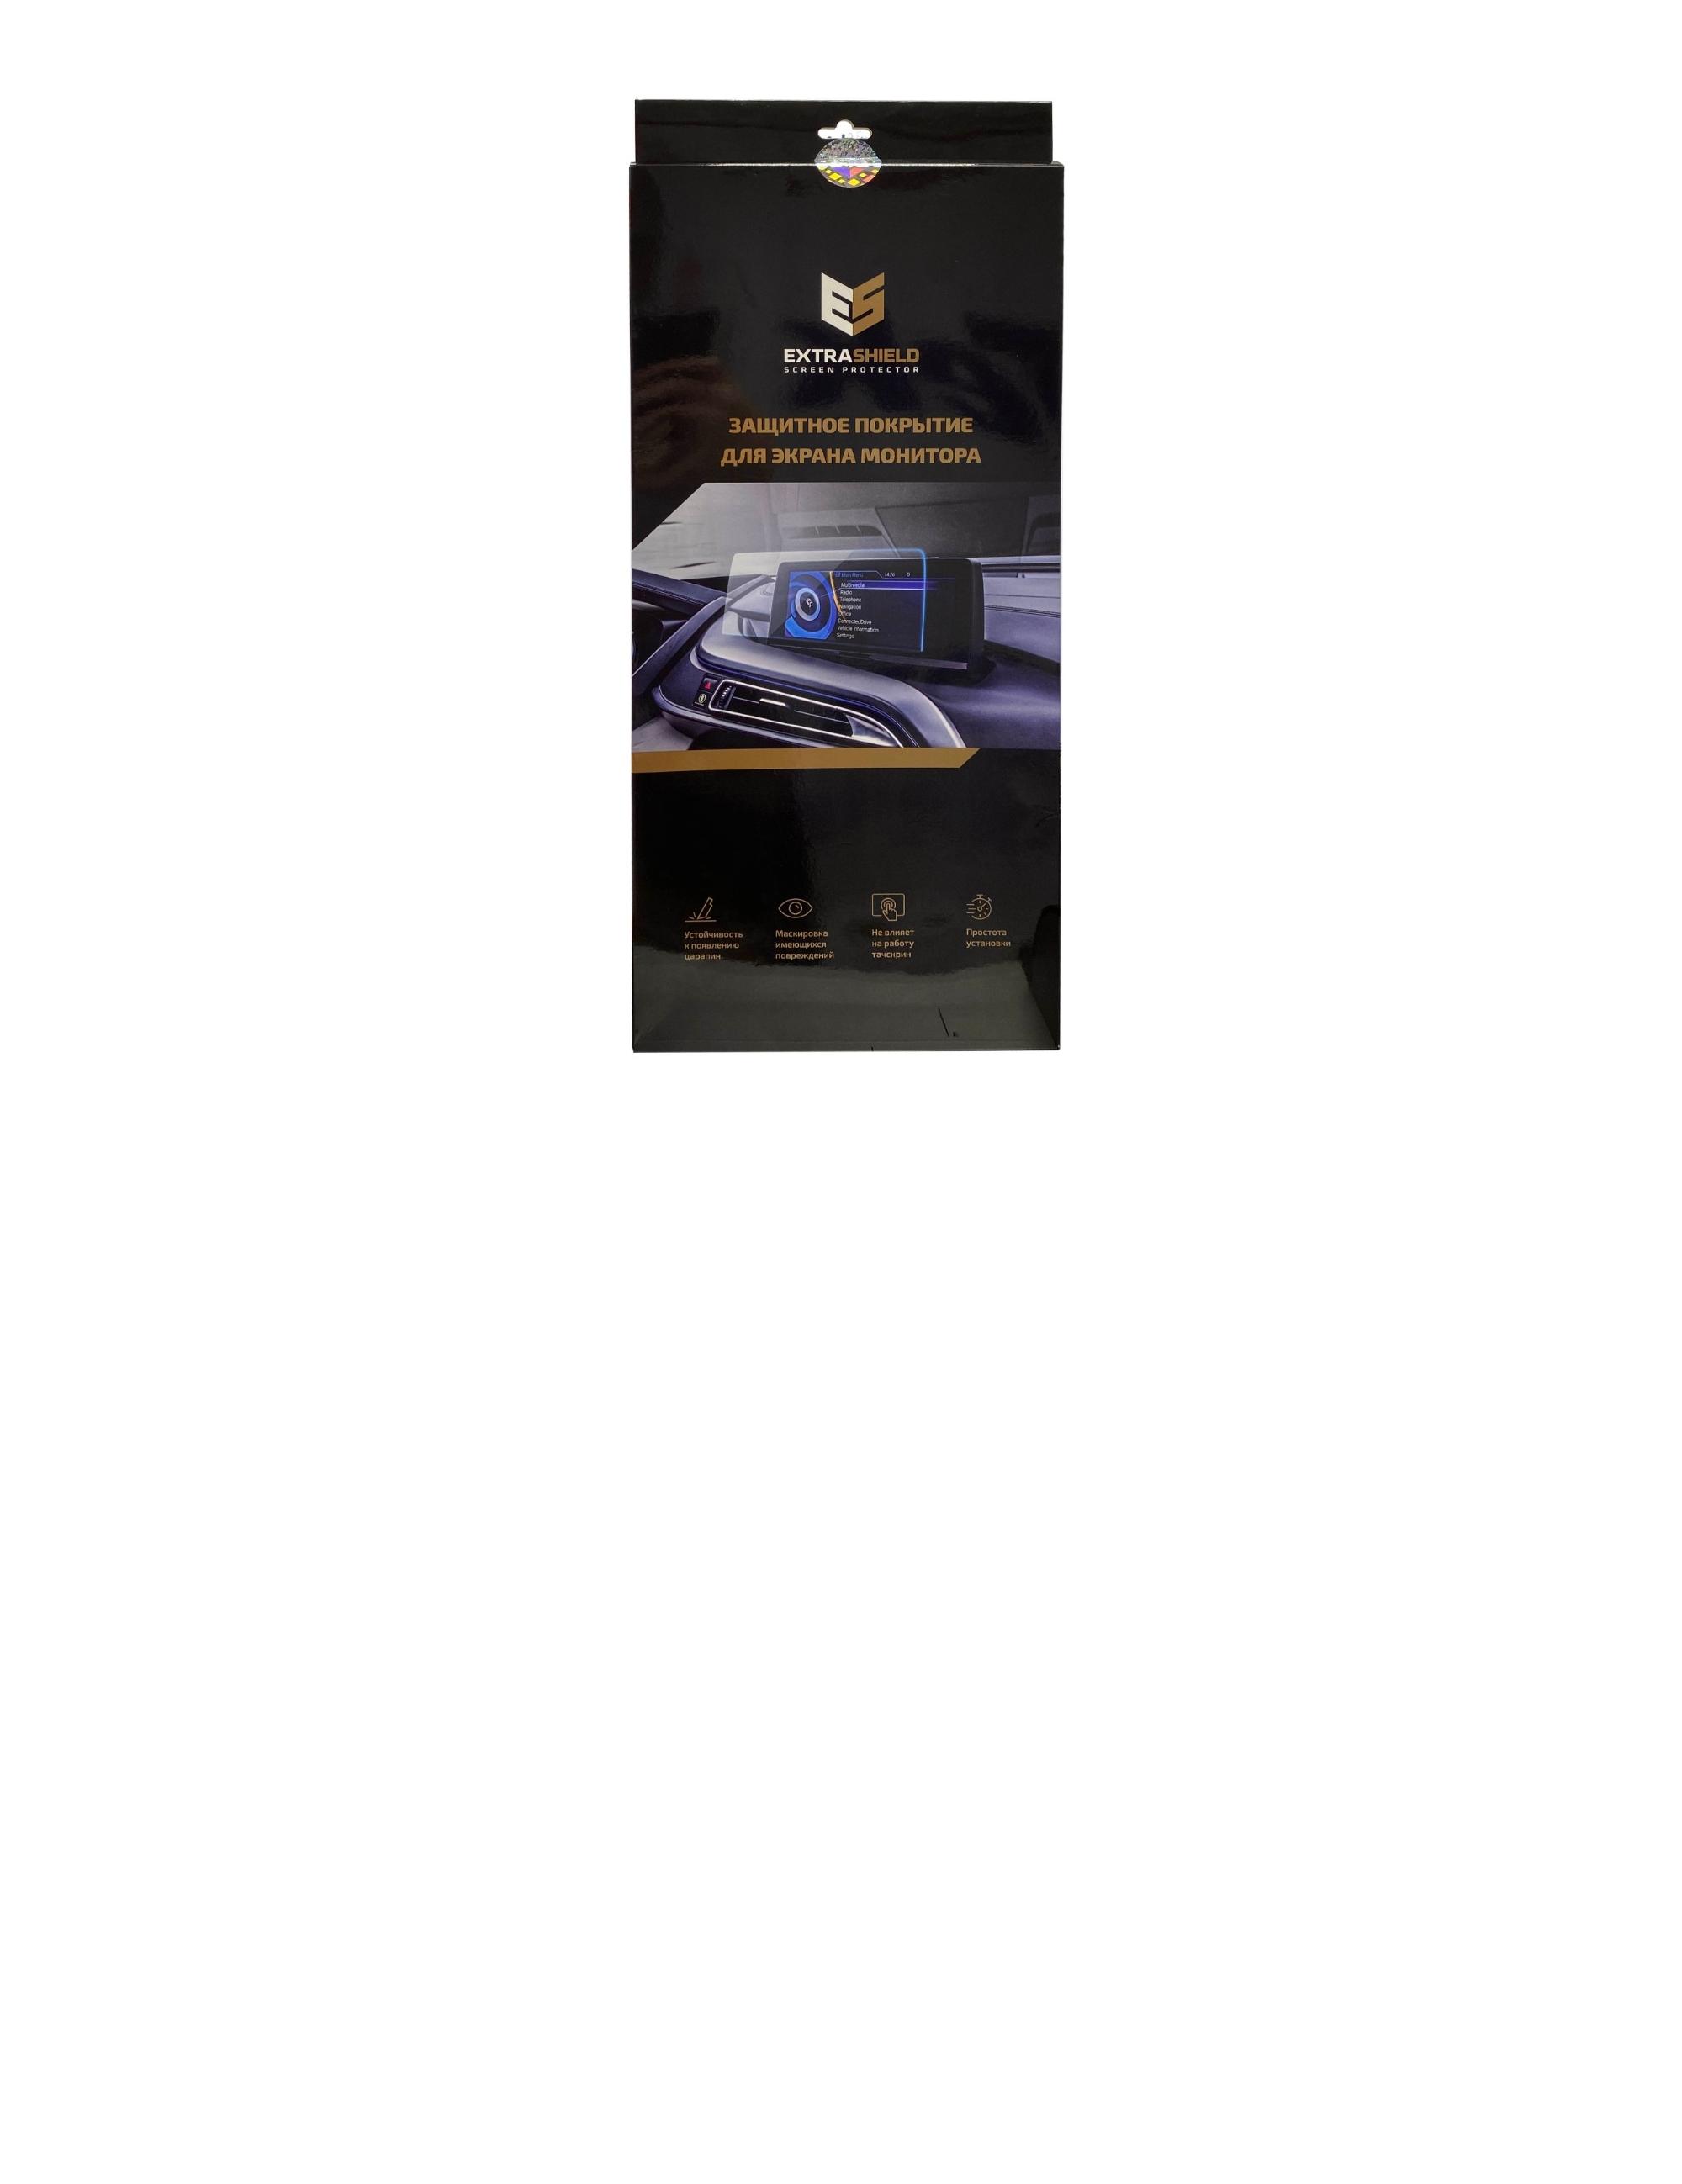 Audi A7 II (4K) 2017 - н.в. приборная панель Audi Virtual Cockpit 12.3 Защитное стекло Глянец